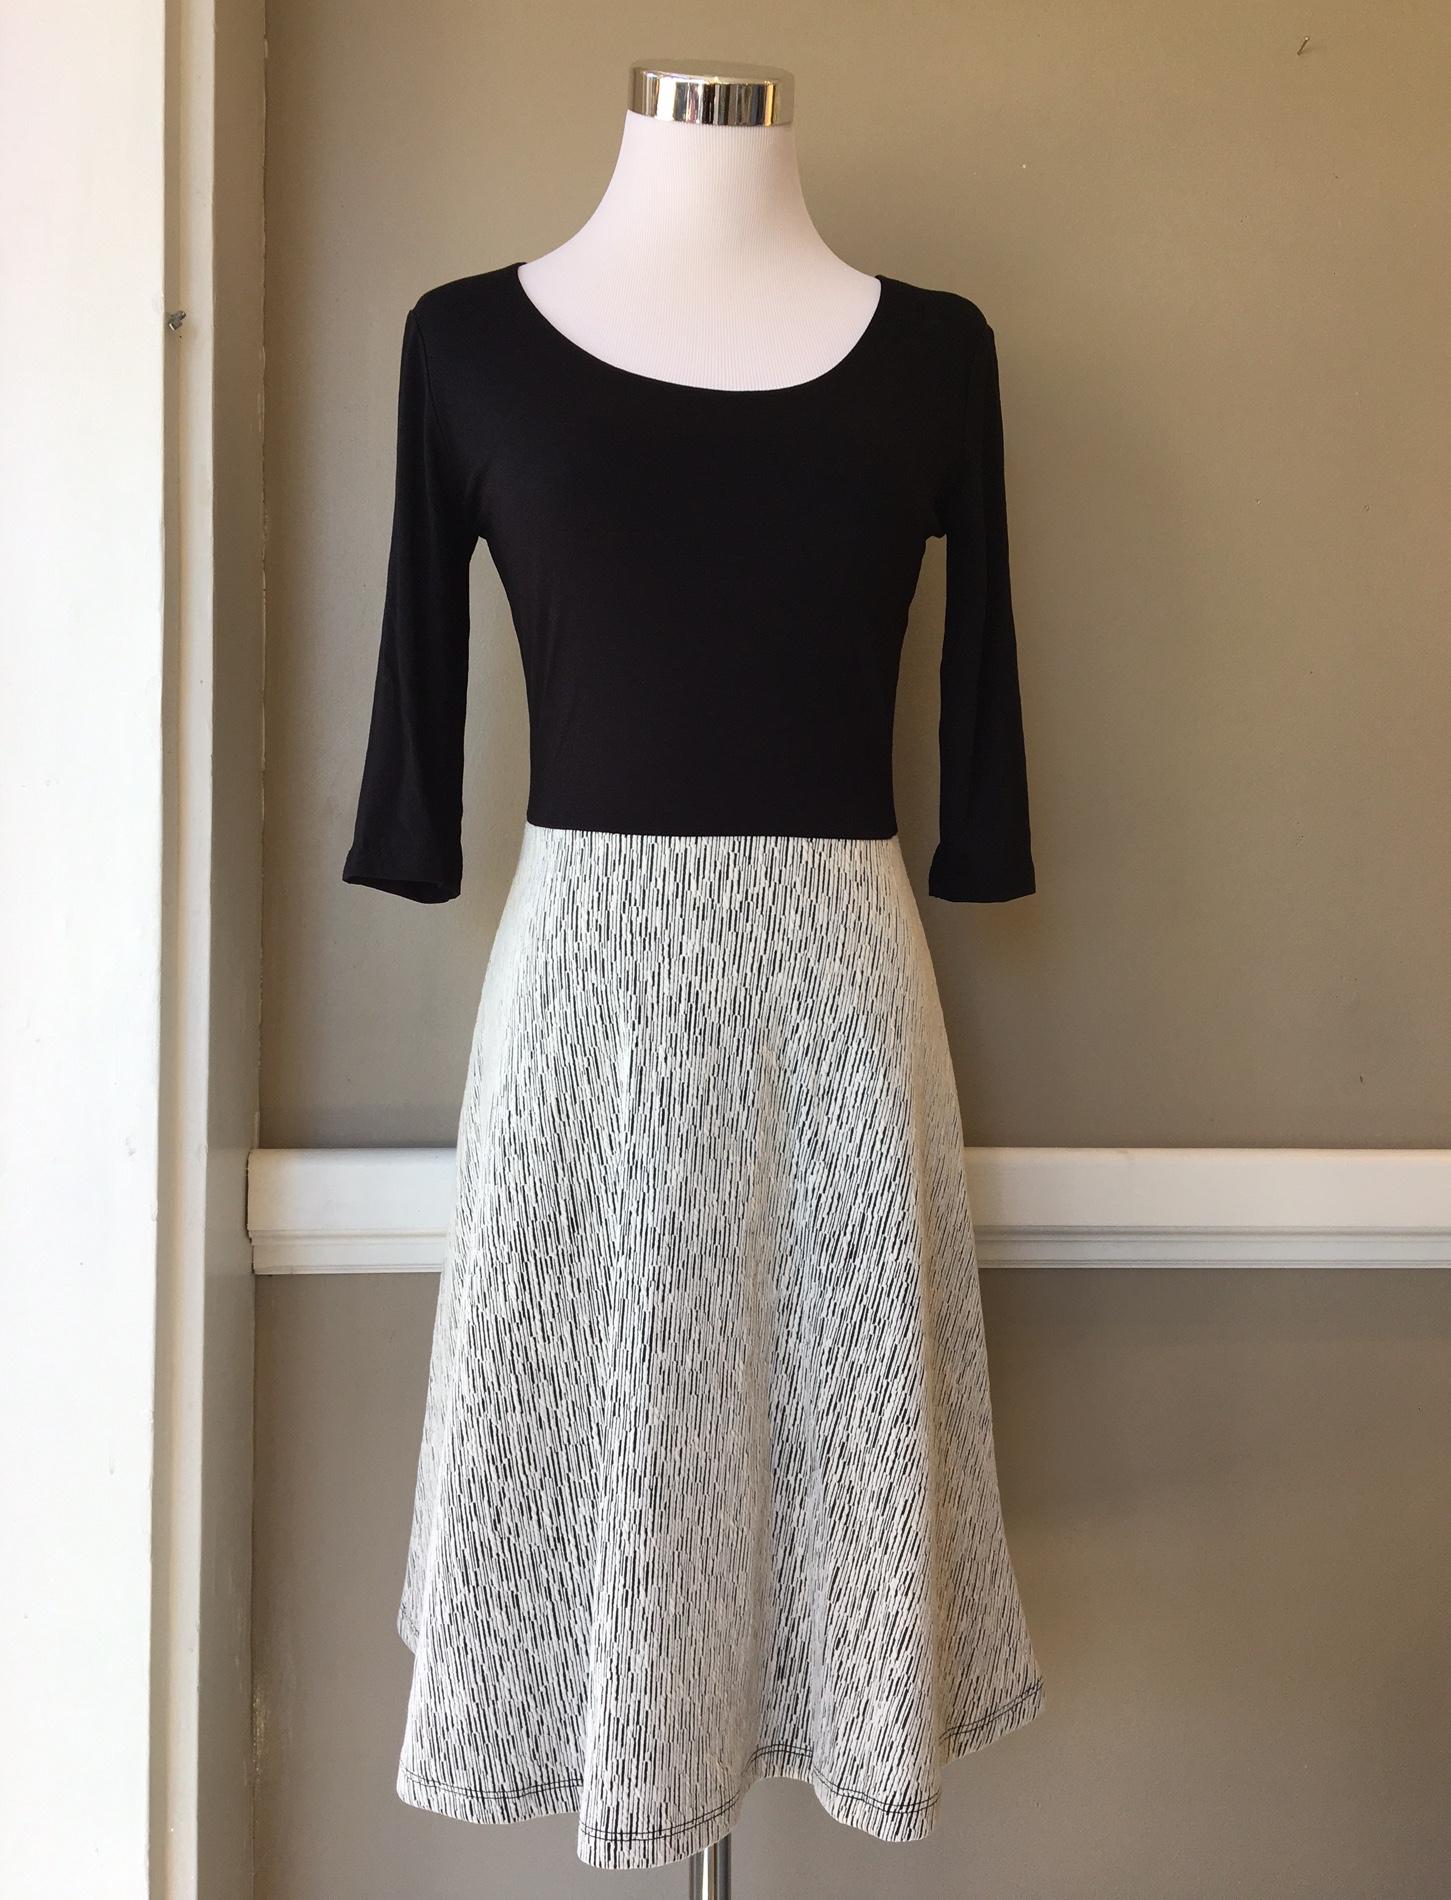 Black and White Dress ($45)